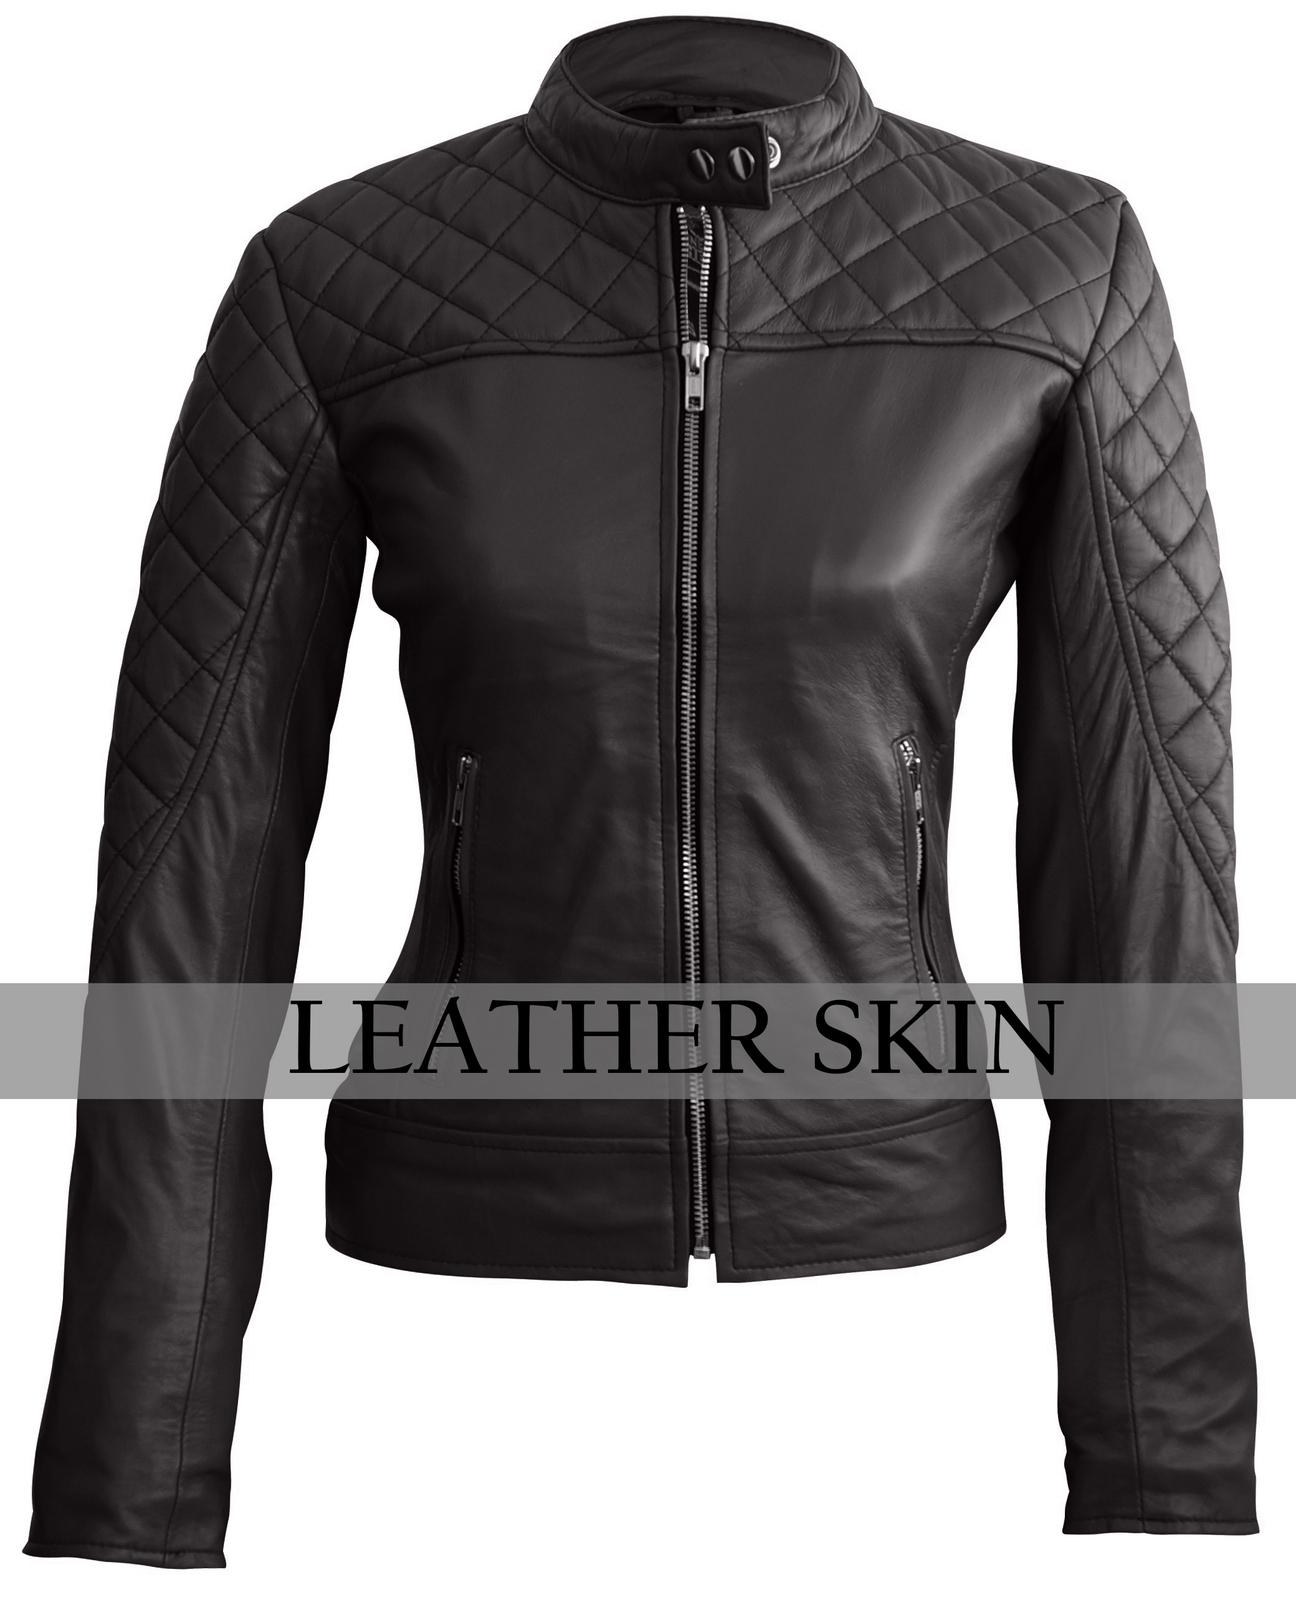 Premium leather jackets